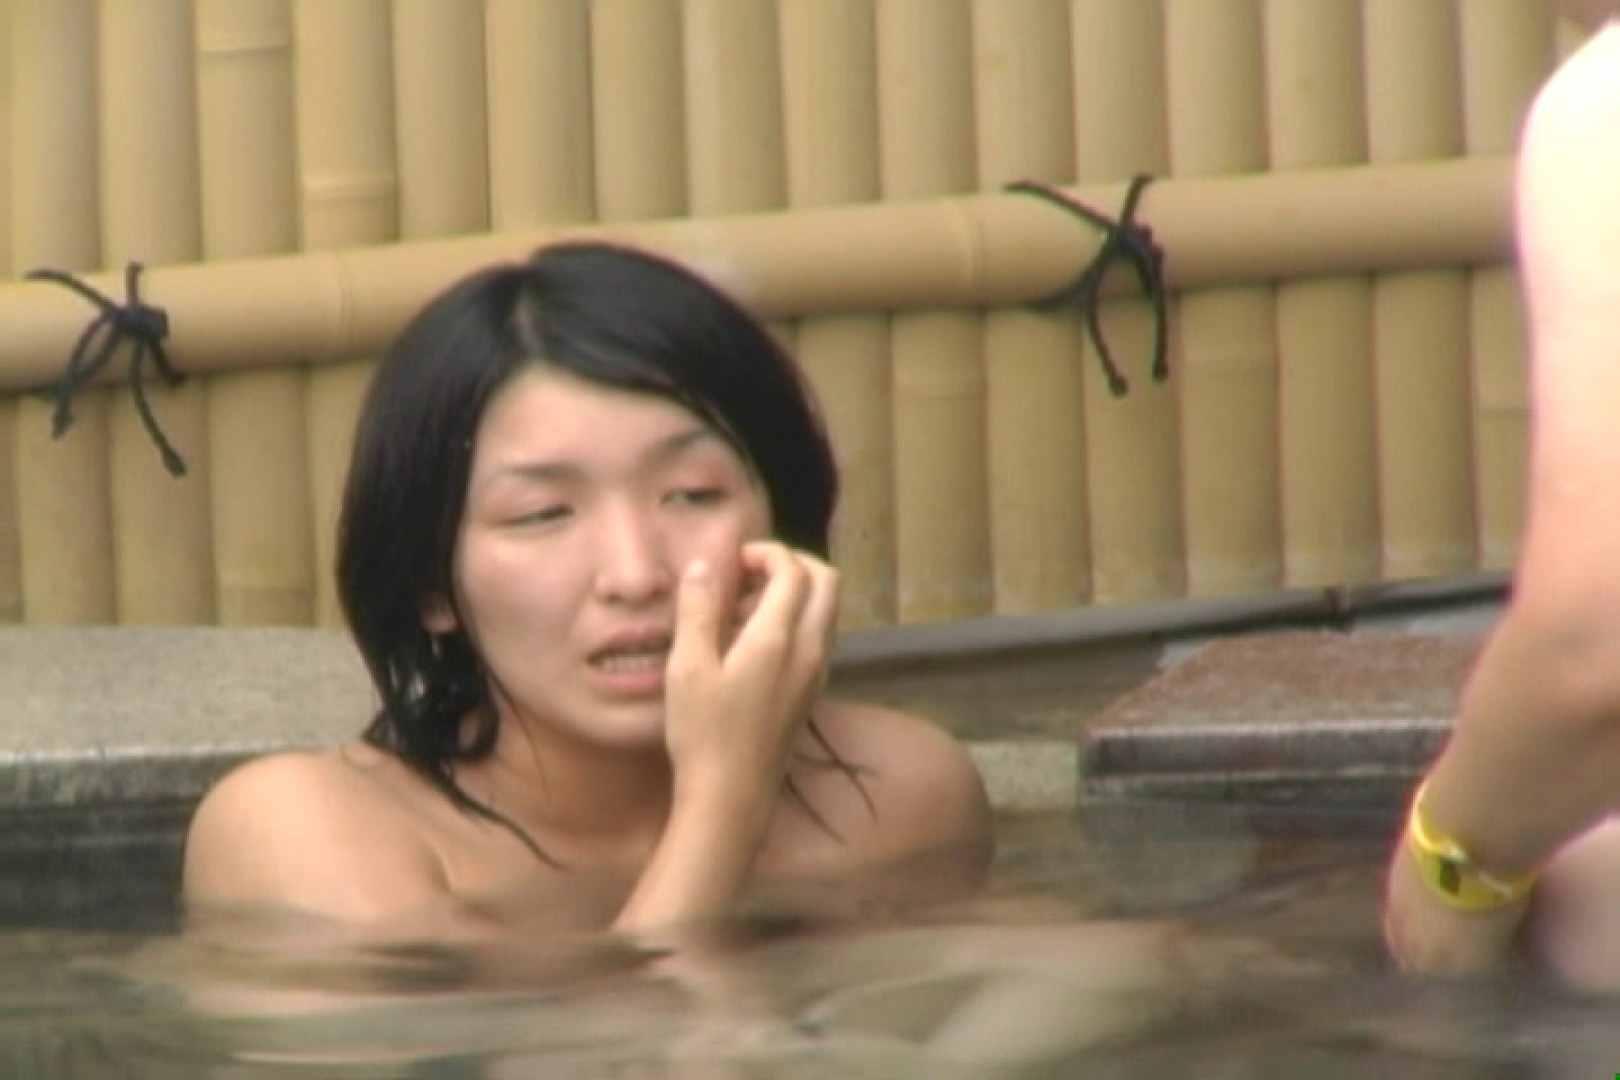 Aquaな露天風呂Vol.618 露天風呂 エロ画像 67連発 53